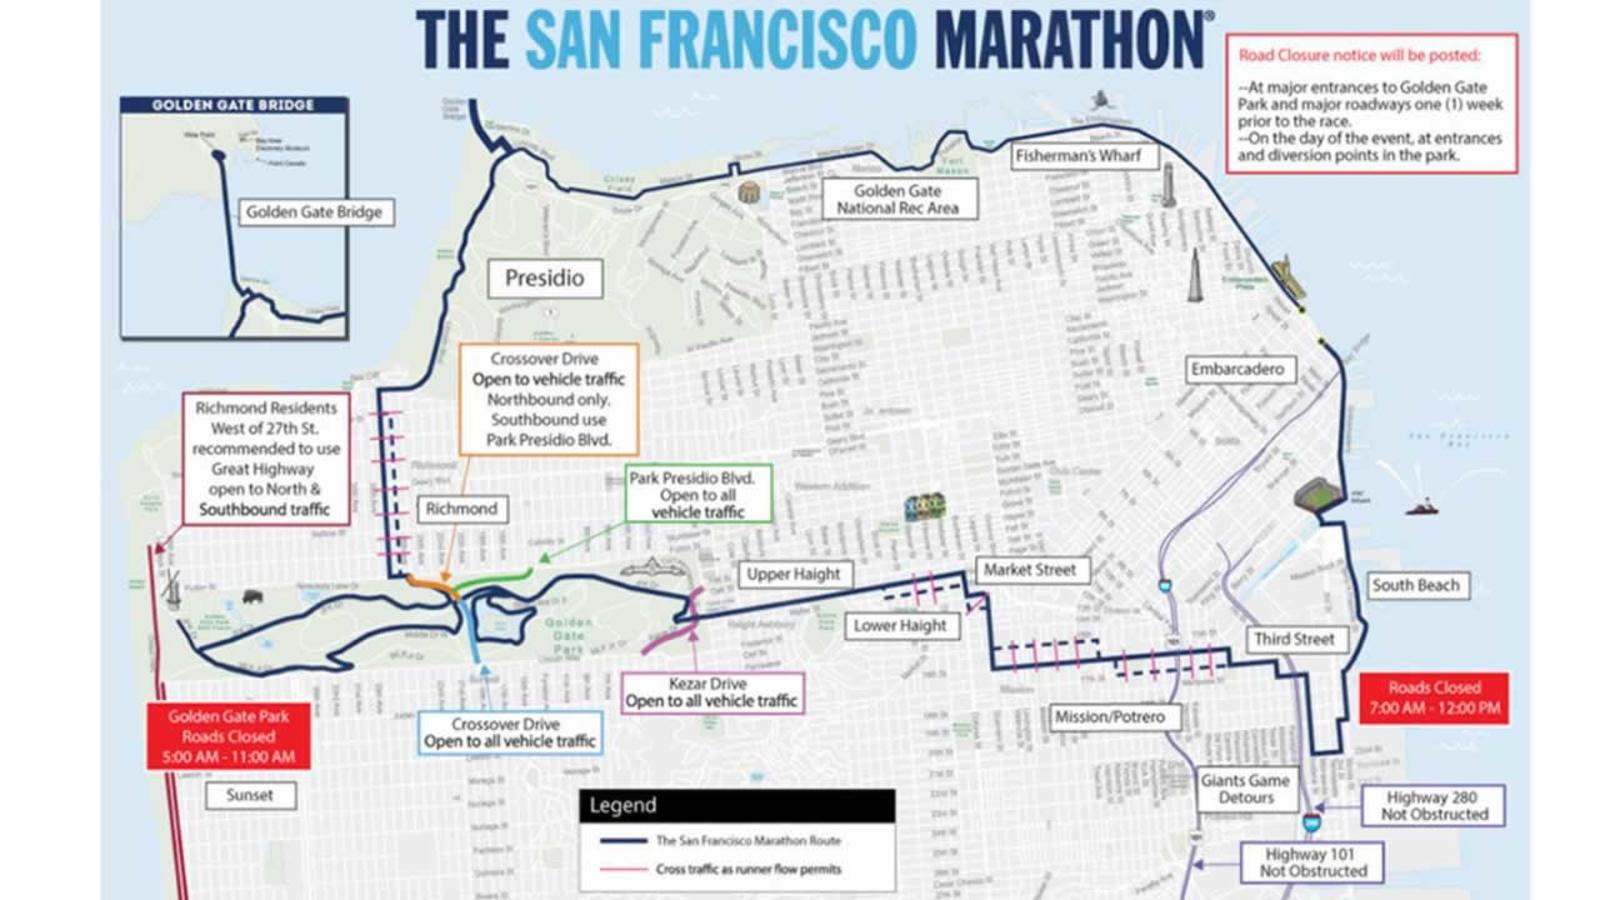 sf marathon elevation map Full List San Francisco Marathon Road Closures Neighborhood